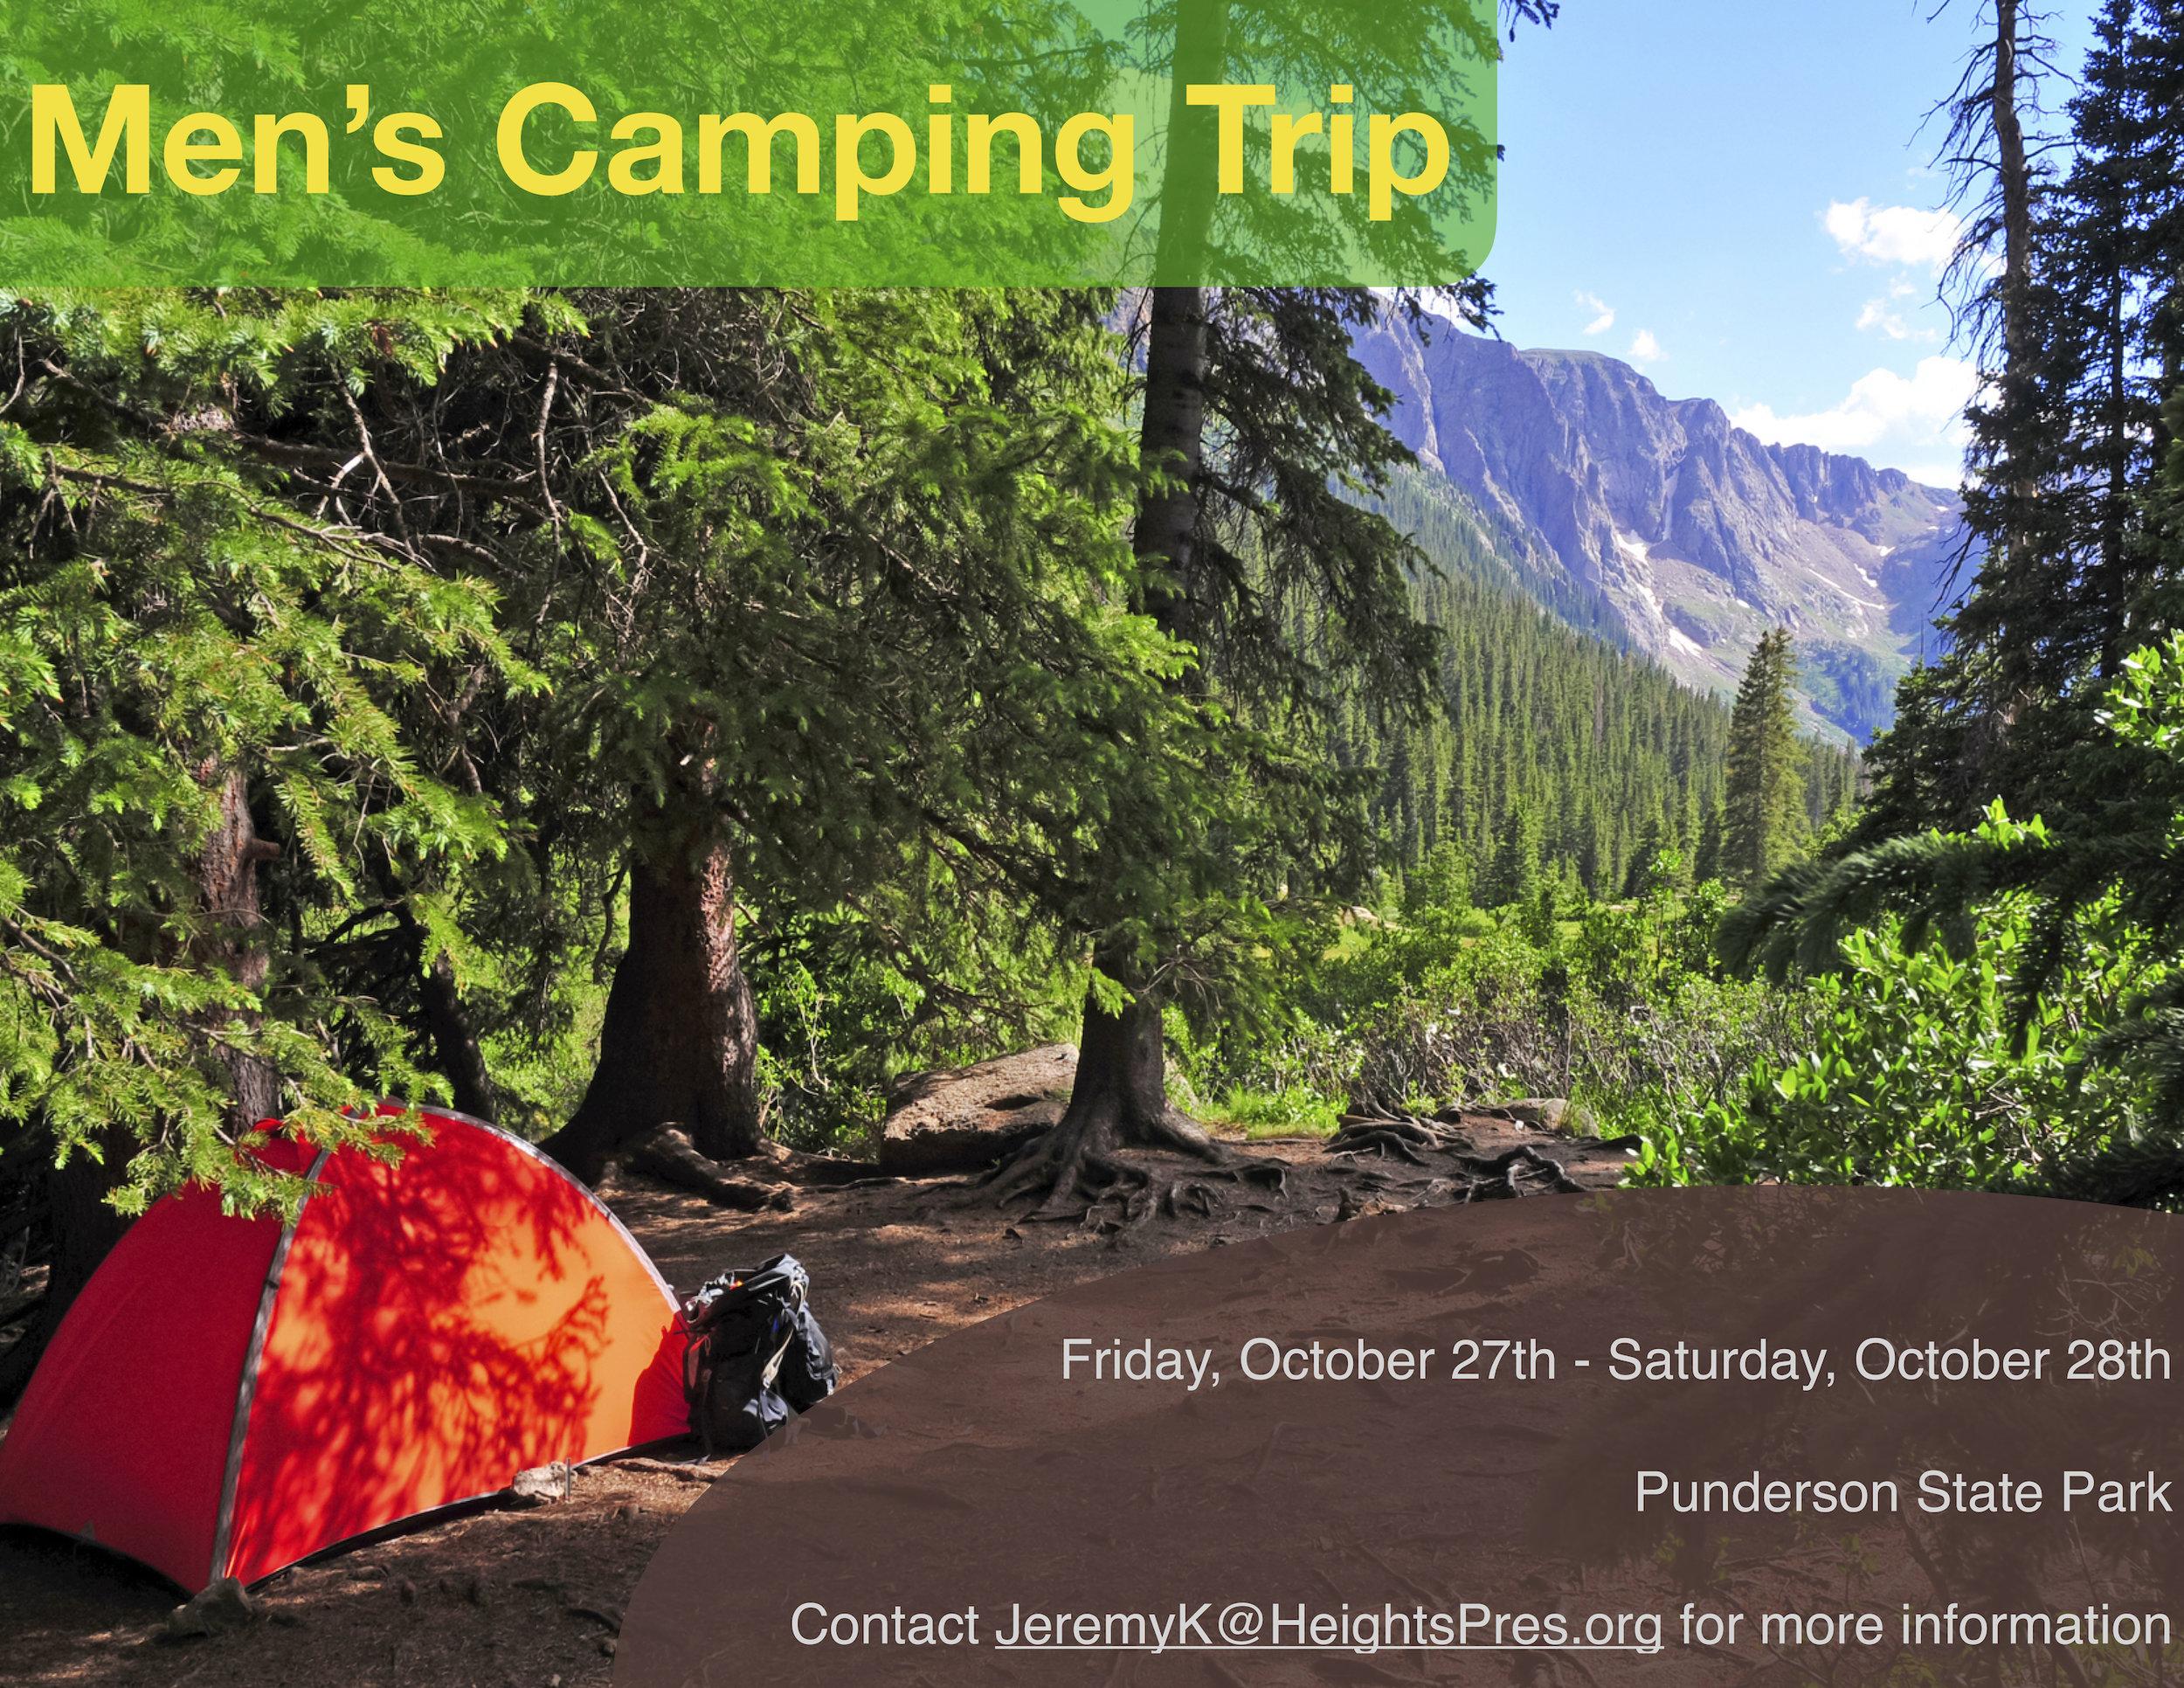 camping trip advert 2.jpg